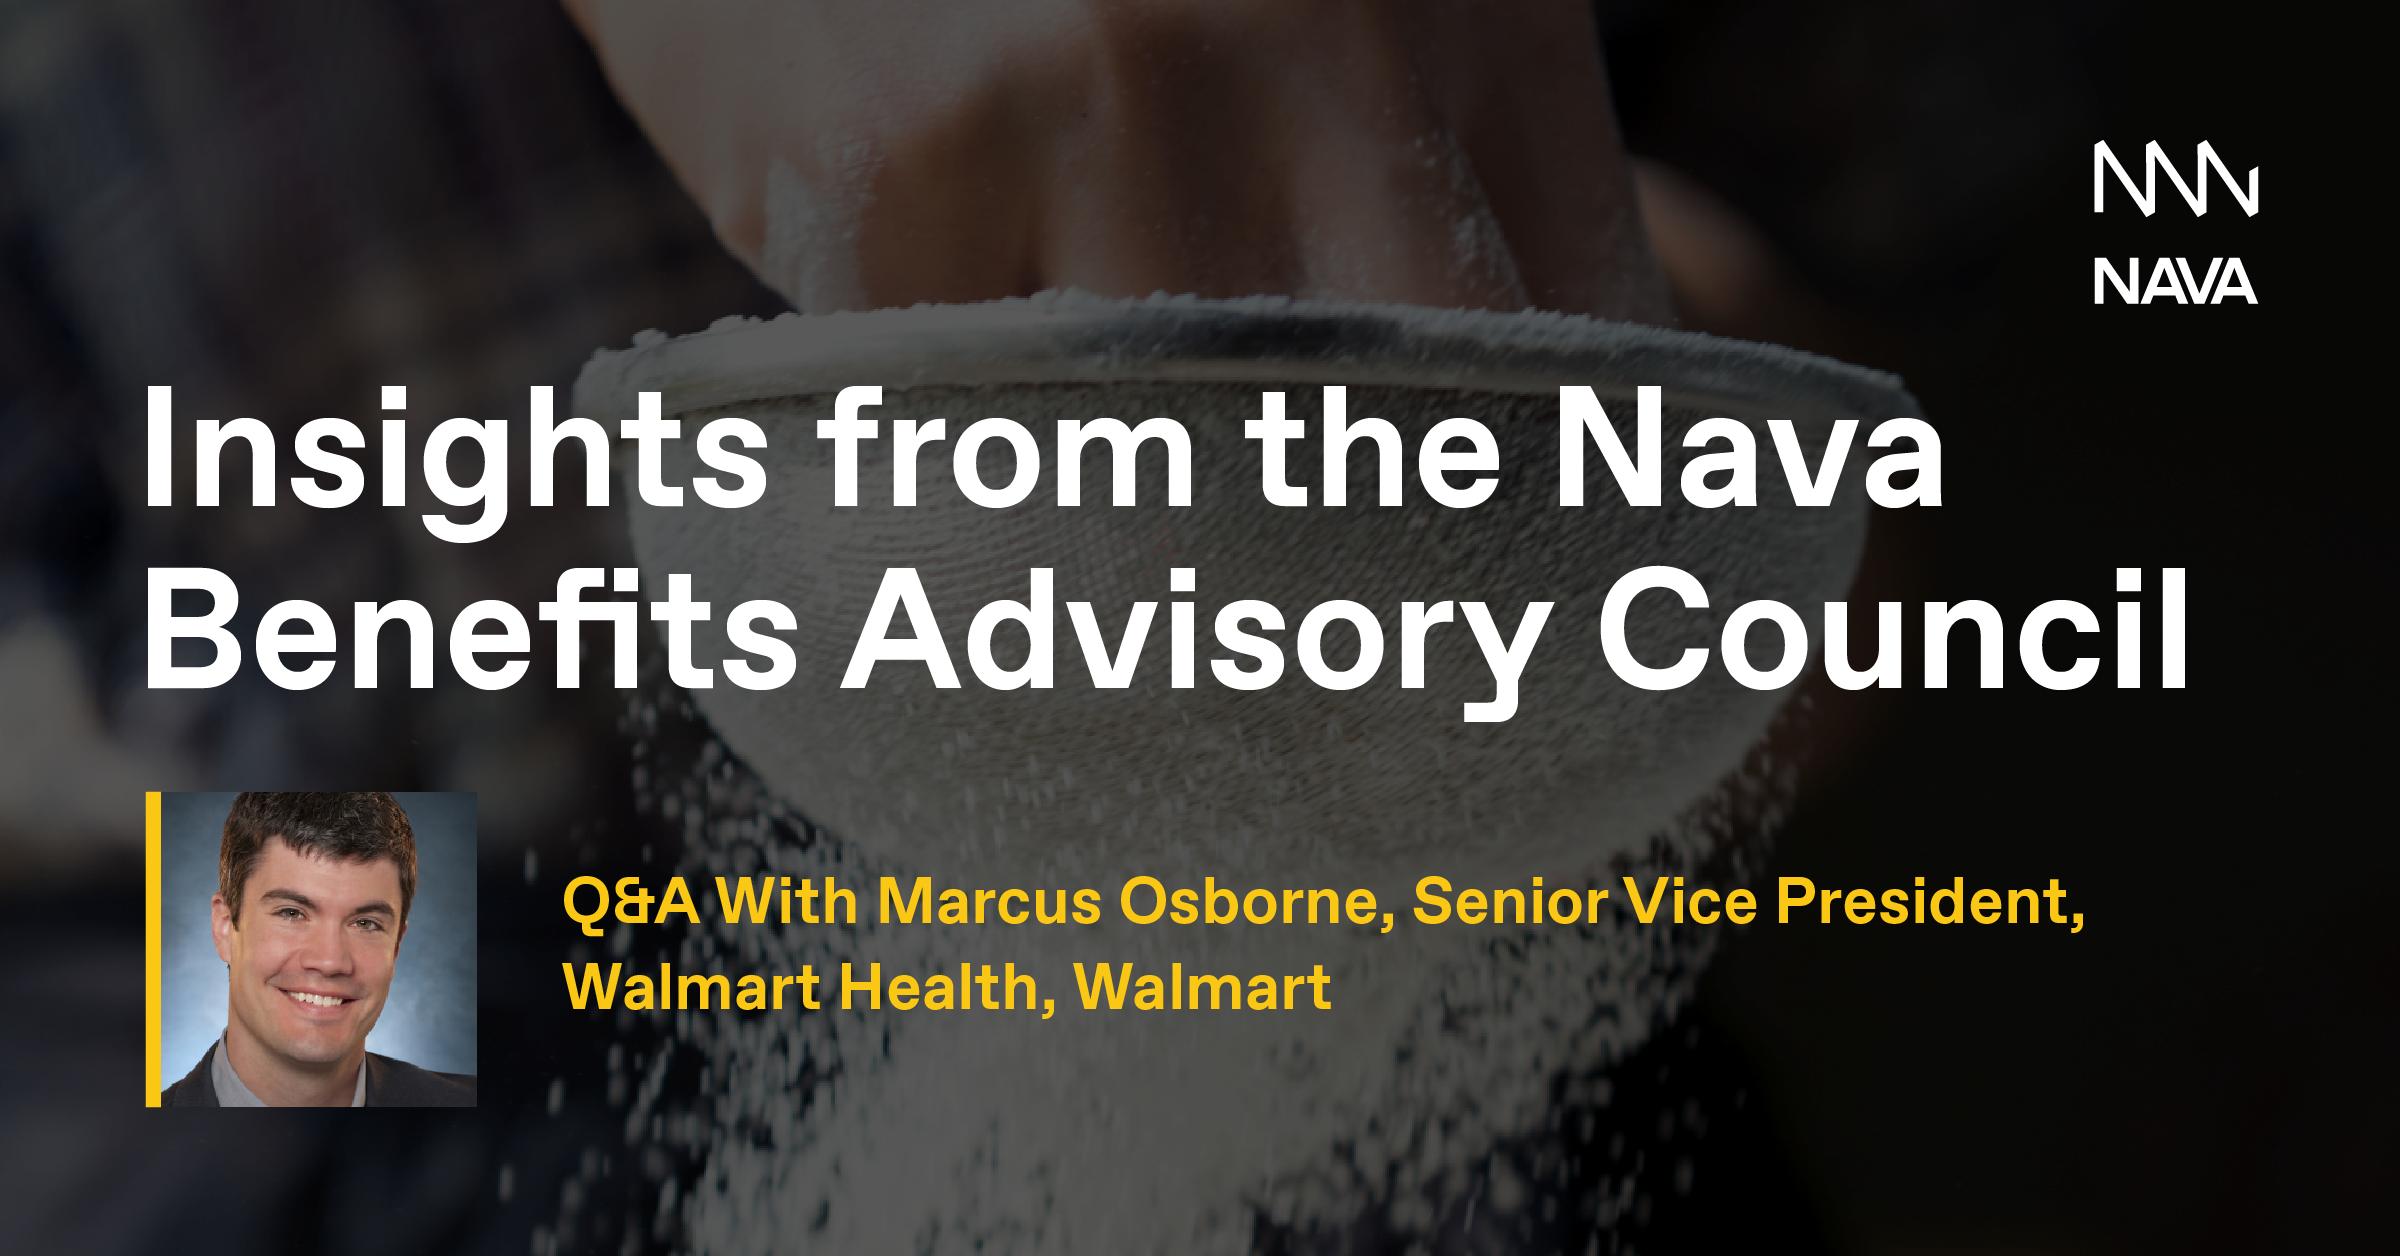 Insights from the Nava Benefits Advisory Council: Marcus Osborne, SVP Walmart Health